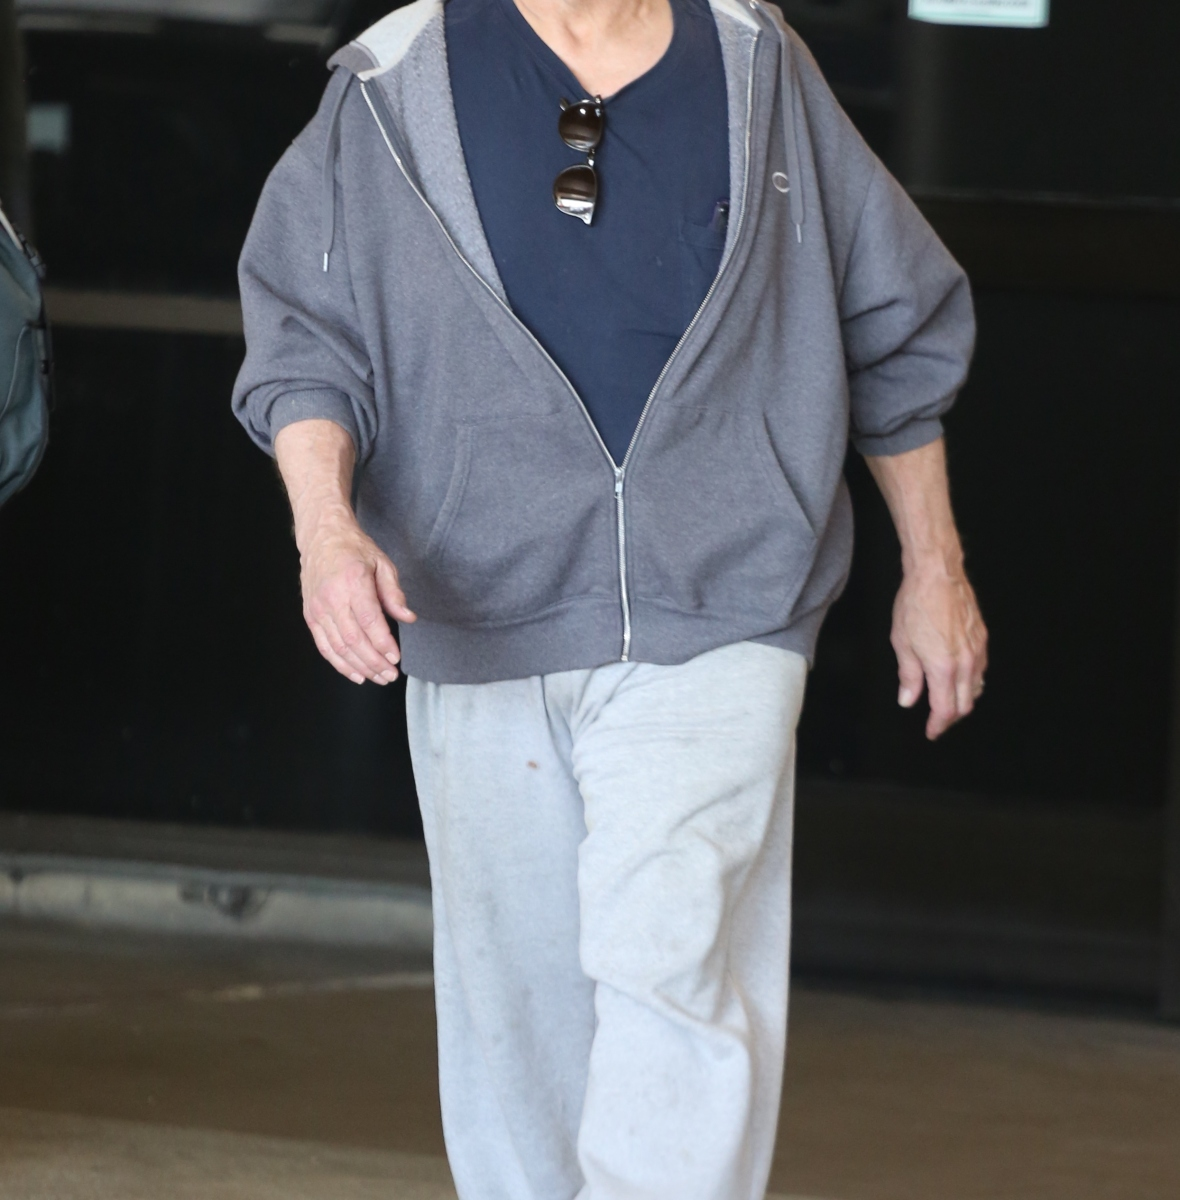 john goodman weight loss splash